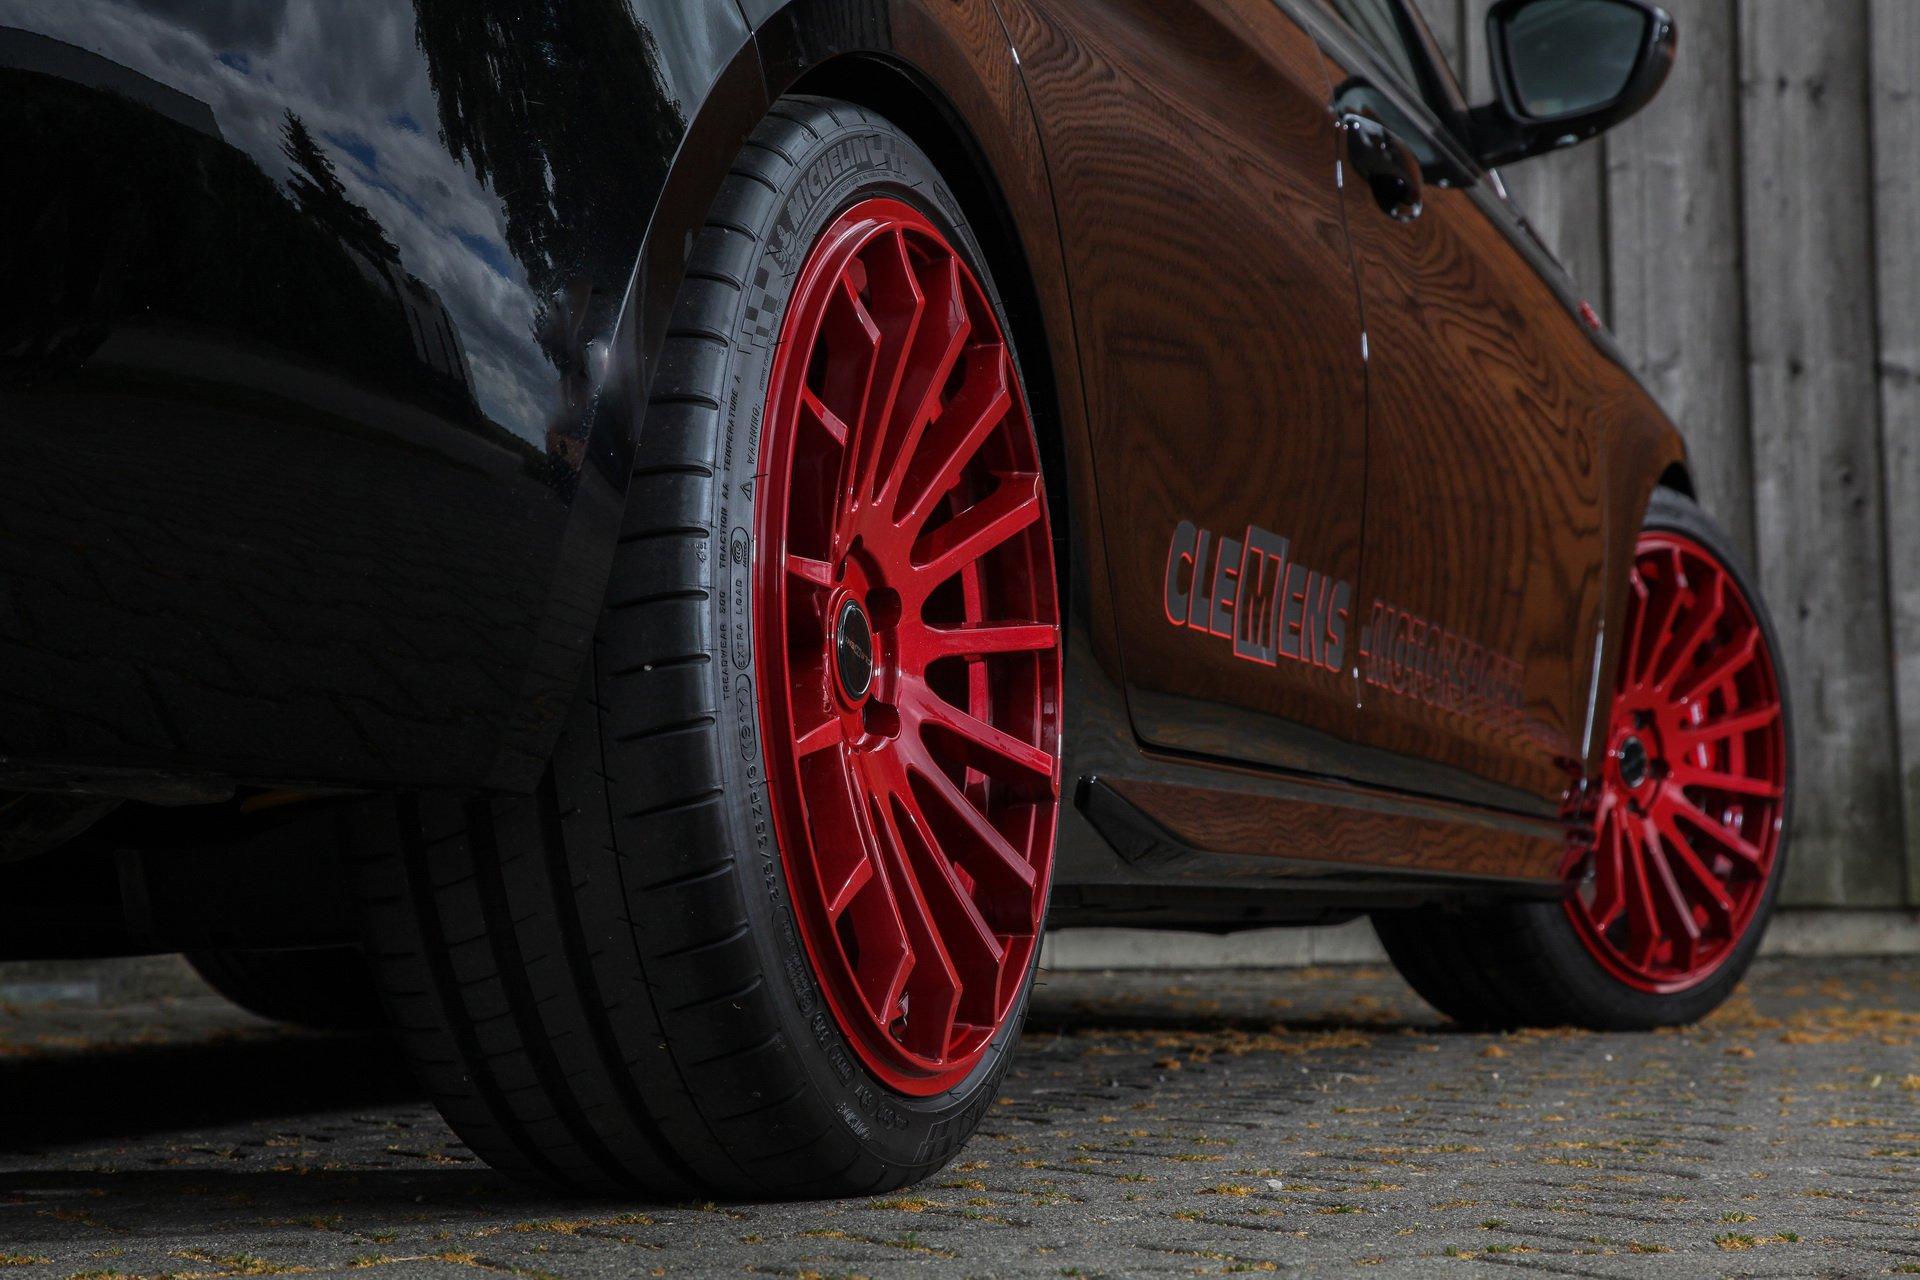 Peugeot_308_GTi_by_Clemens_Motorsport_0014